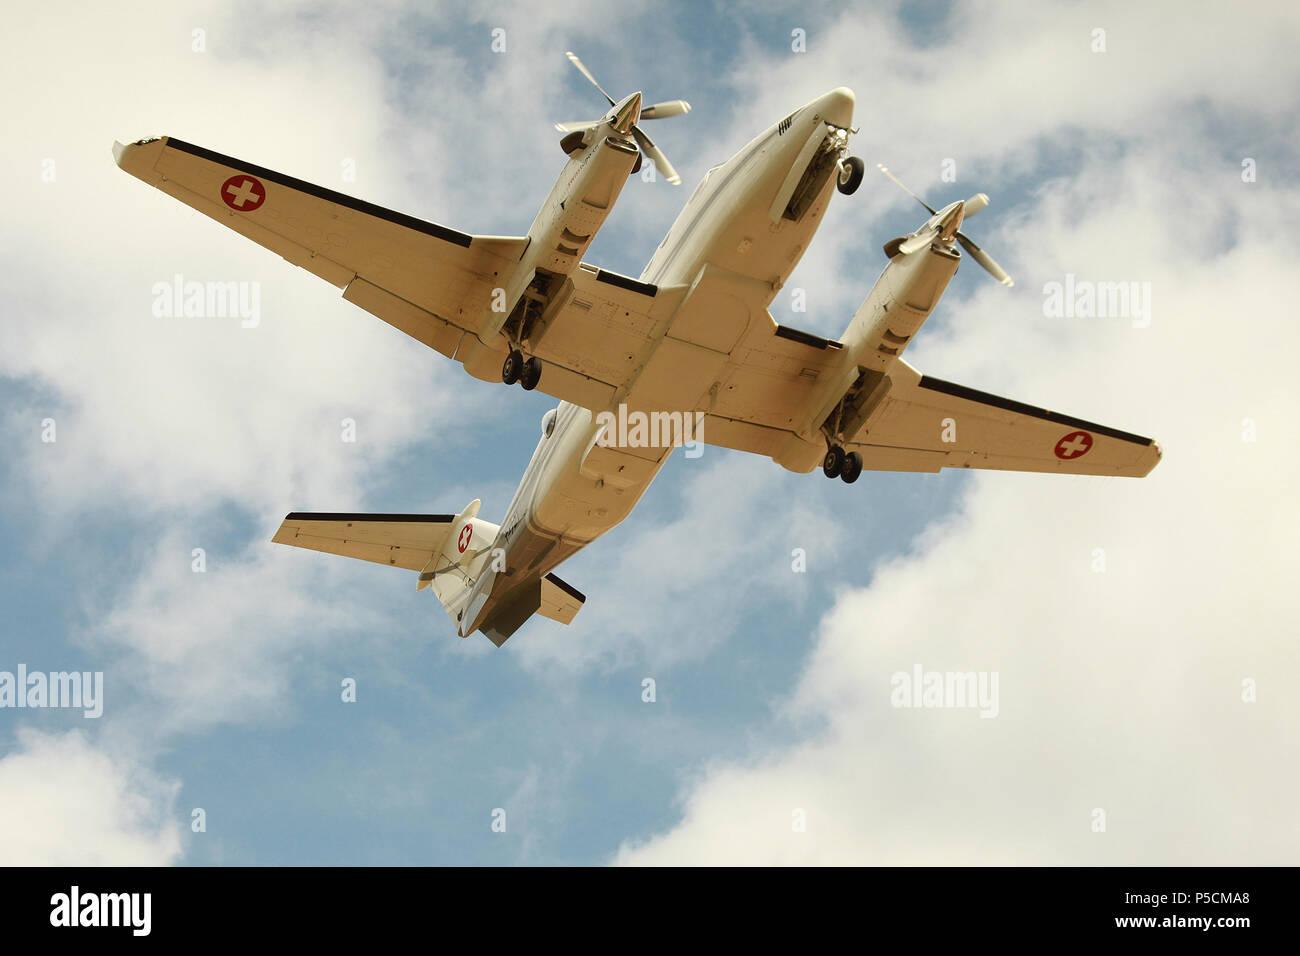 aircraft landing at Schiphol airport - Stock Image